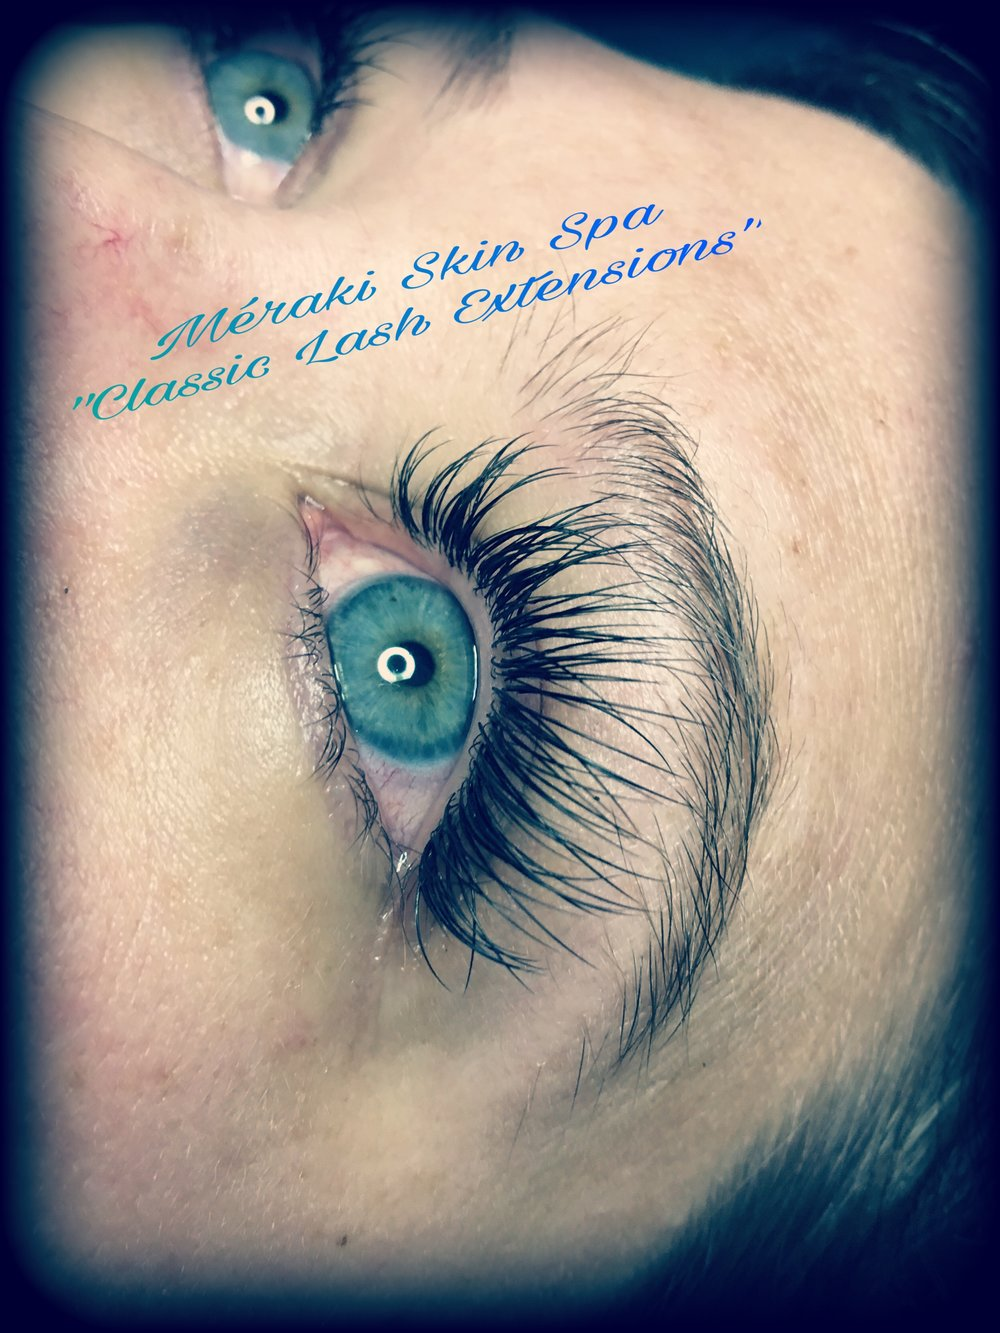 meridian Idaho classic eyelash extensions B CURL-CLASSIC ALT TEXT